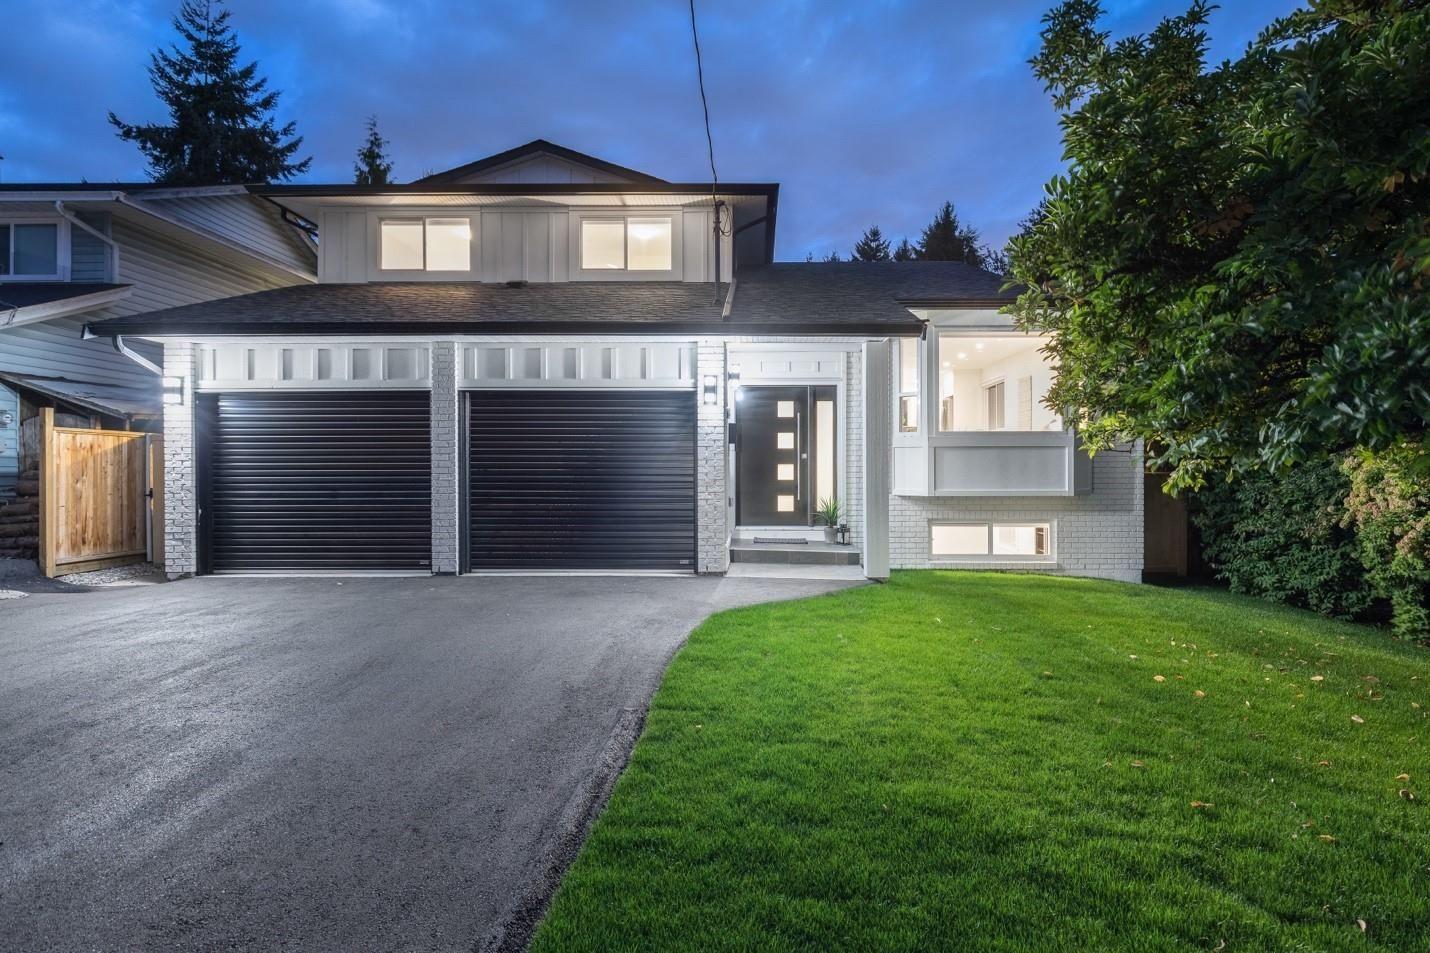 Main Photo: 20340 118 Avenue in Maple Ridge: Southwest Maple Ridge House for sale : MLS®# R2618165